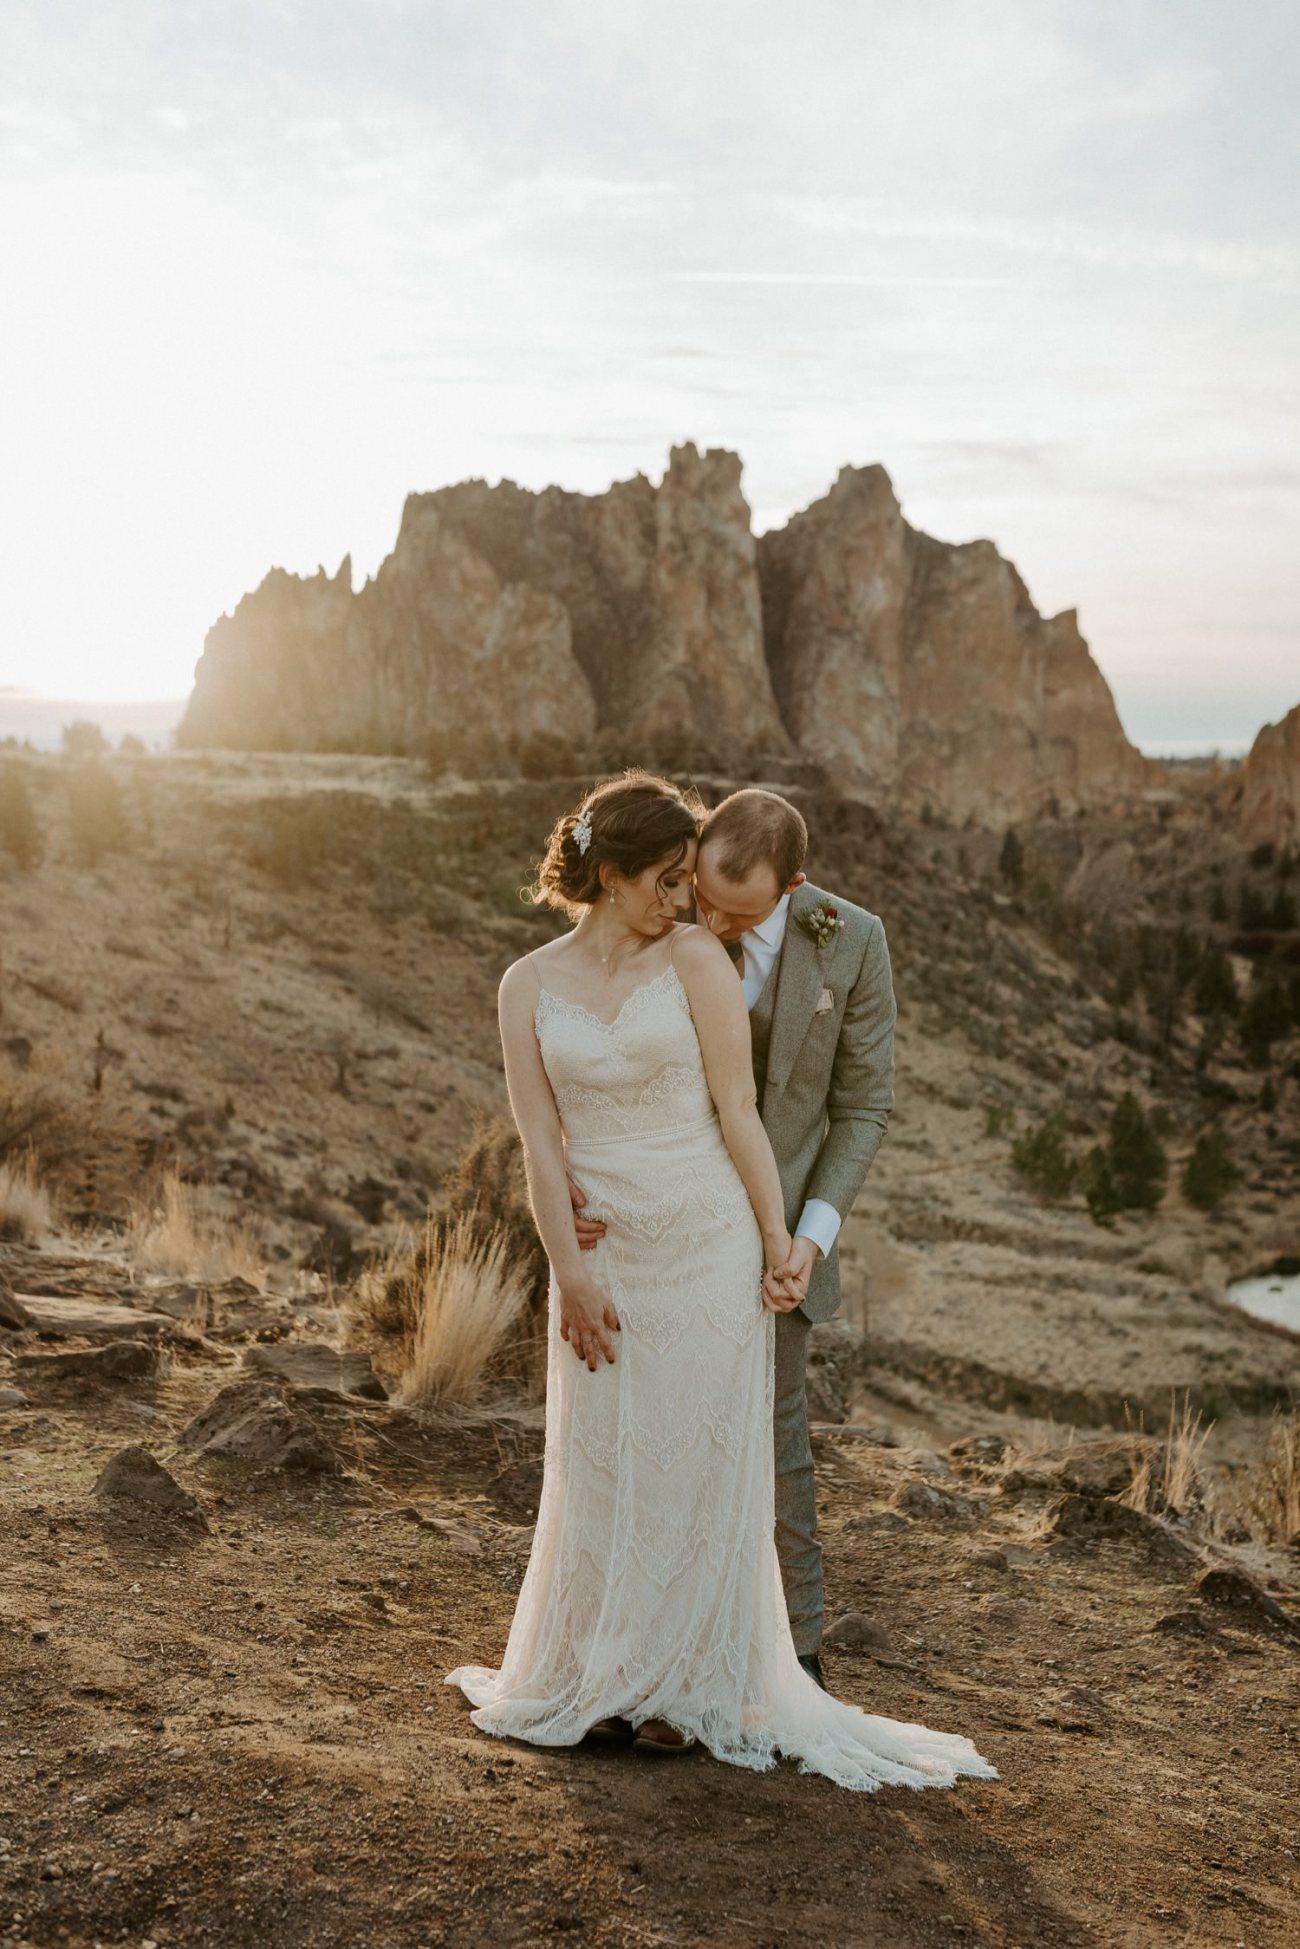 Smith Rock State Park Elopement Bend Oregon Elopement Photographer Anais Possamai Photography 018